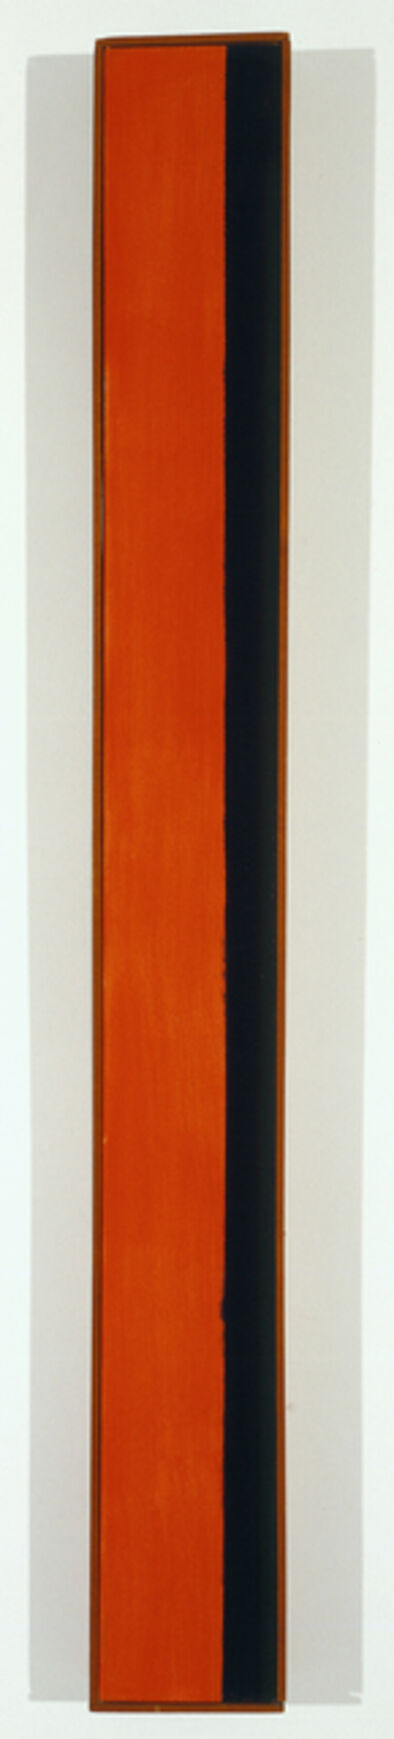 Barnett Newman, 'Untitled (Number 2)', 1950